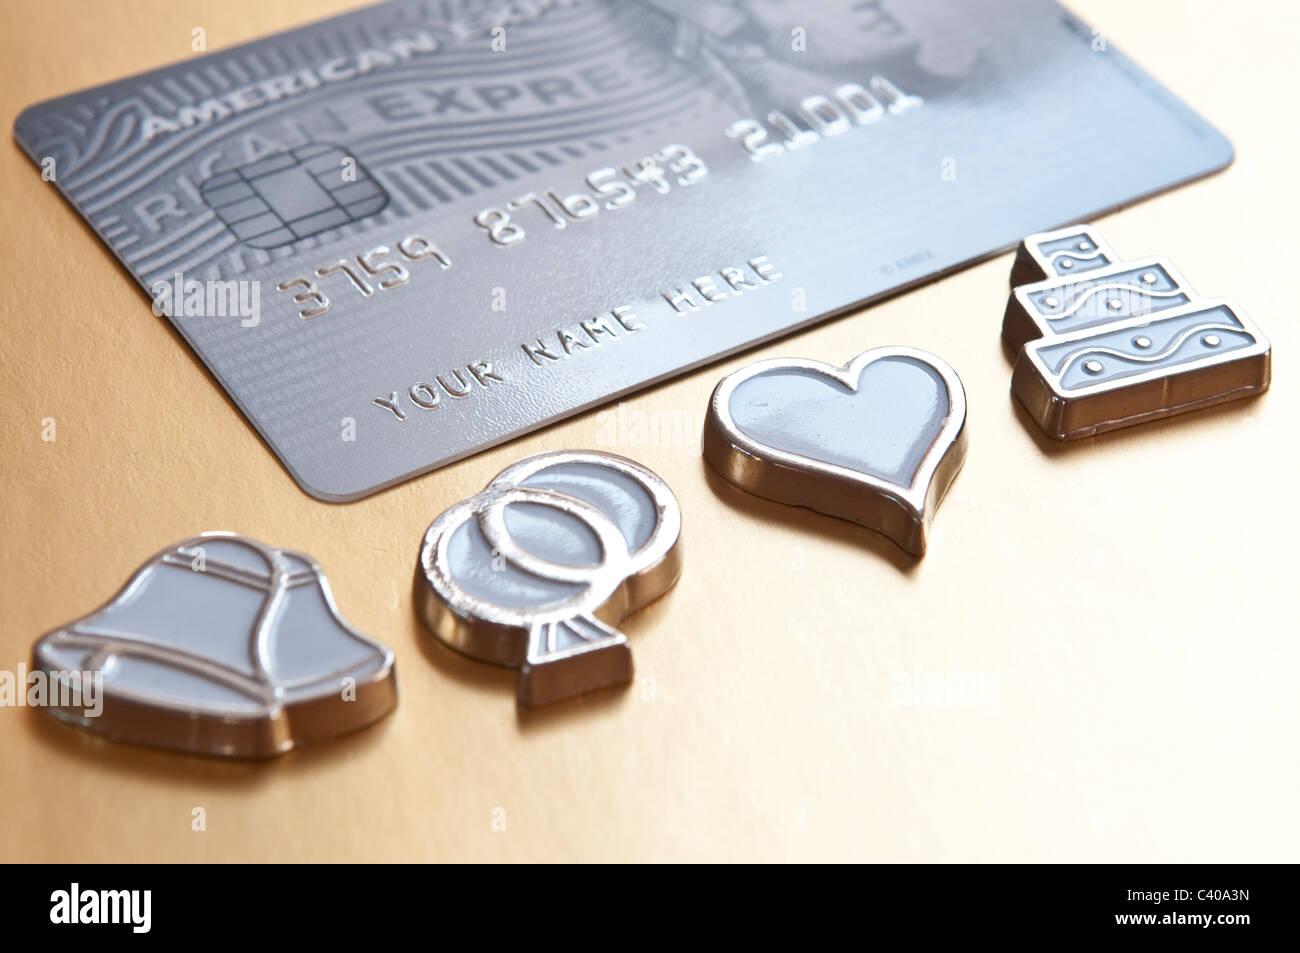 Cost of  wedding. Wedding symbols, heart, bells, interlocked wedding rings, and blank credit card - Stock Image